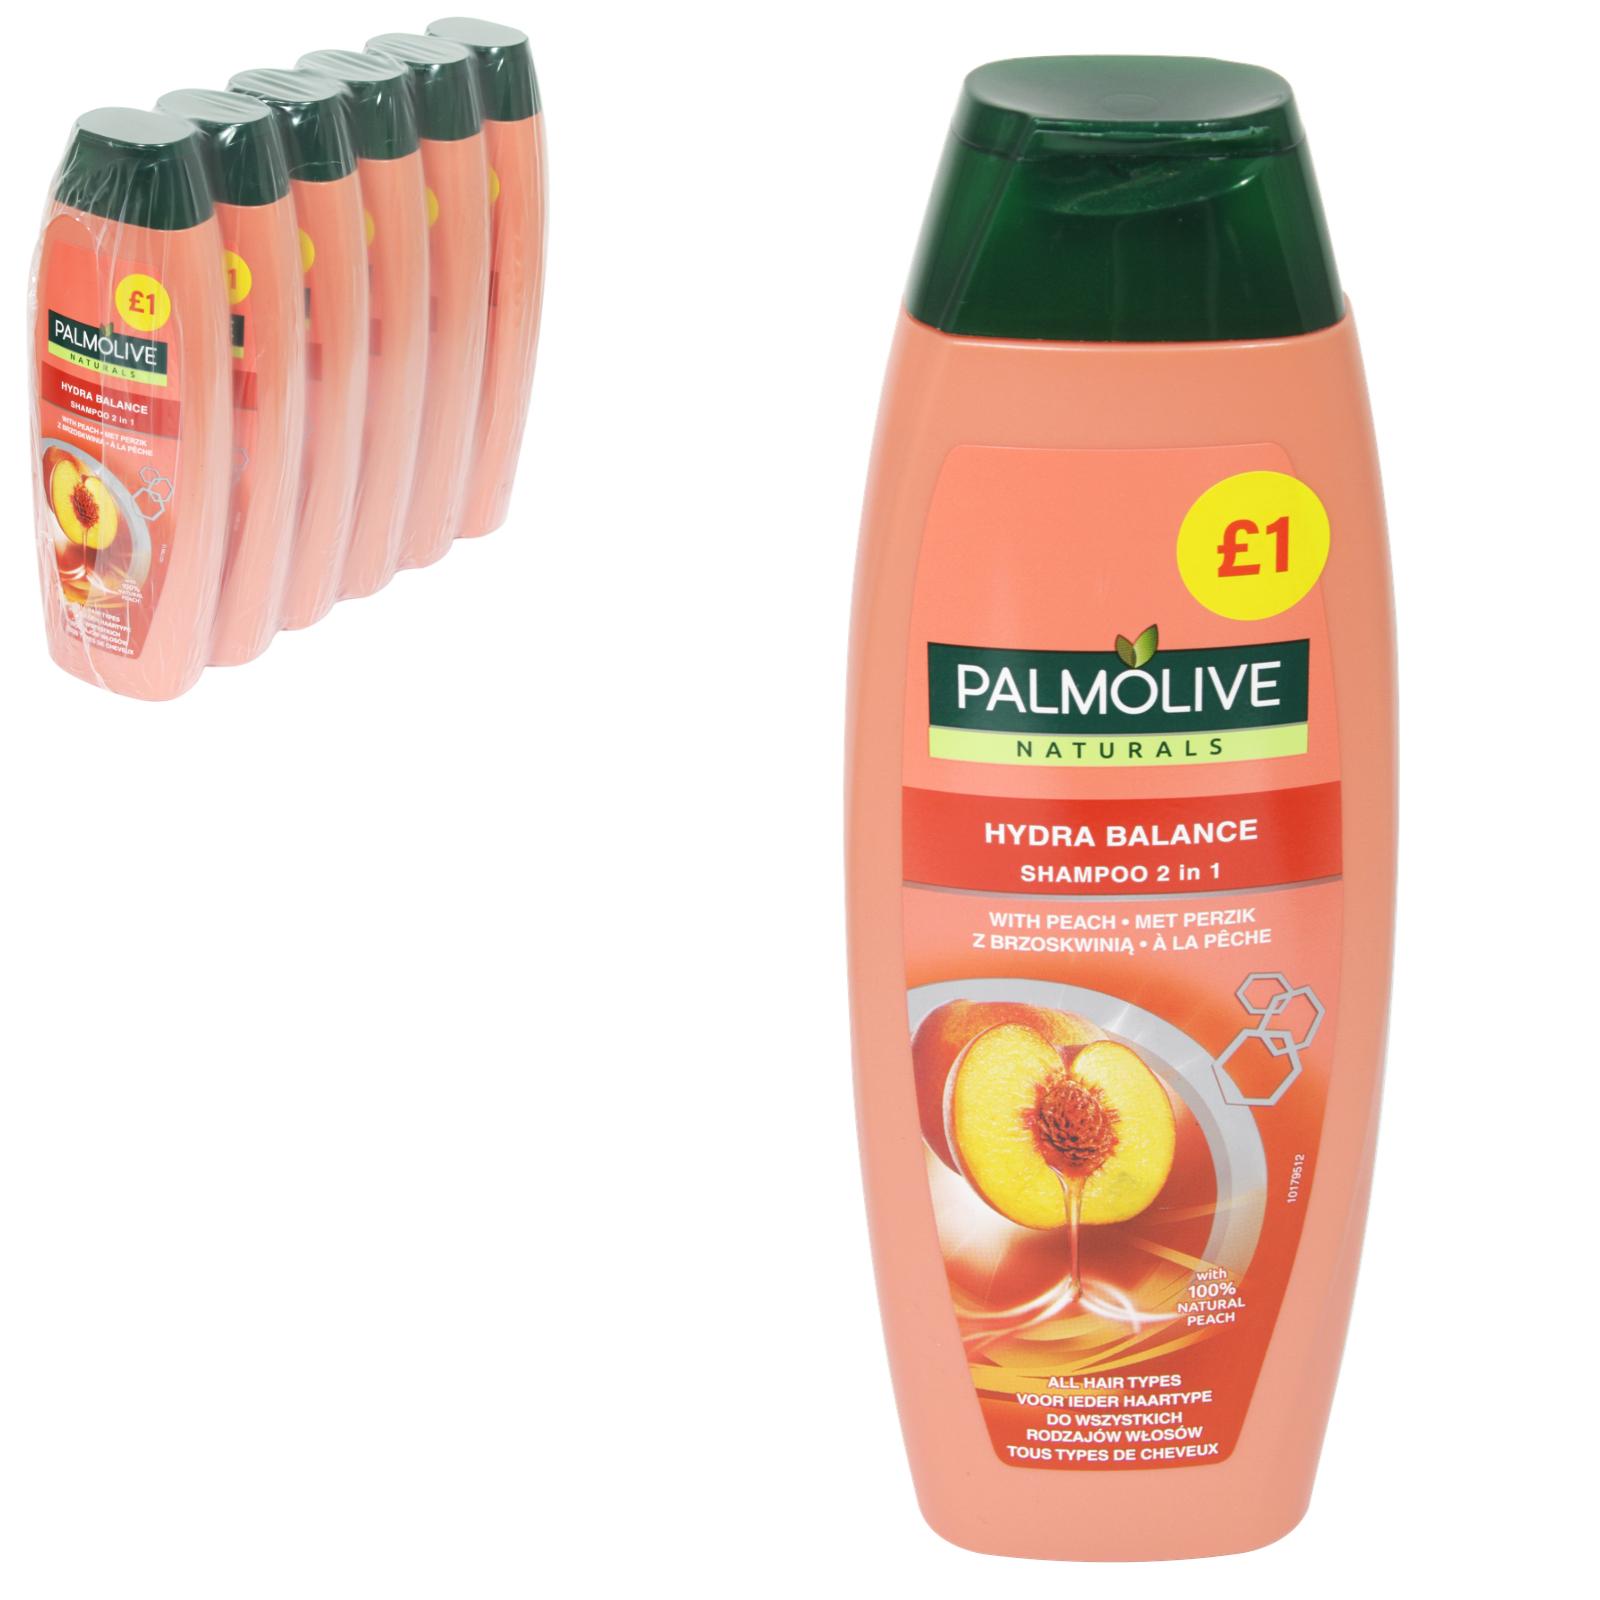 PALMOLIVE SHAMPOO 350ML PM?1 2IN1 WITH HYDRA BALANCE WITH PEACH X6